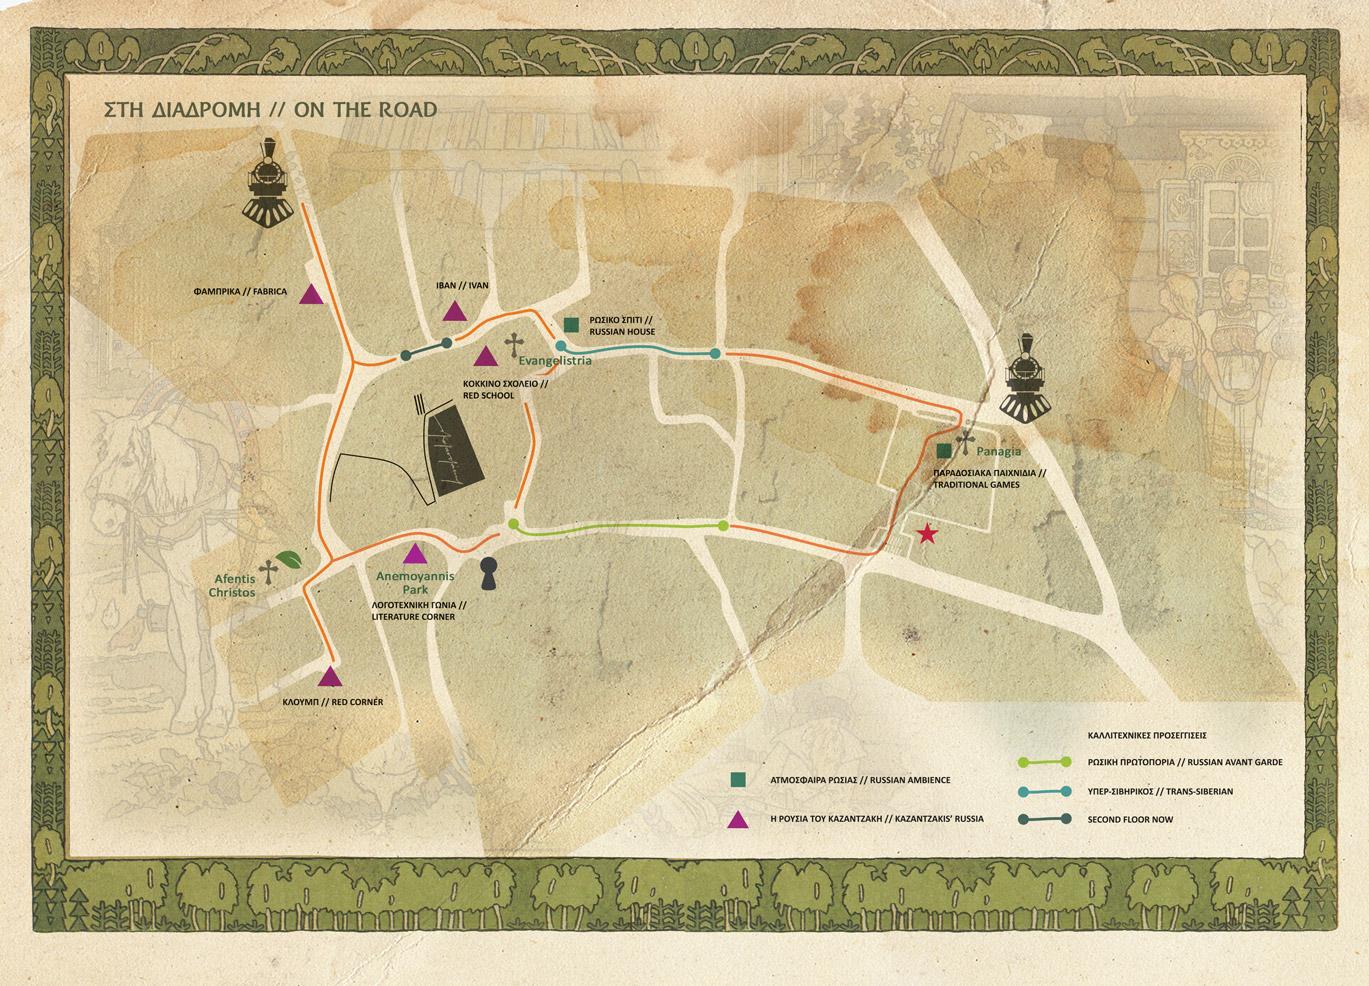 026-027-THE-MAP.jpg